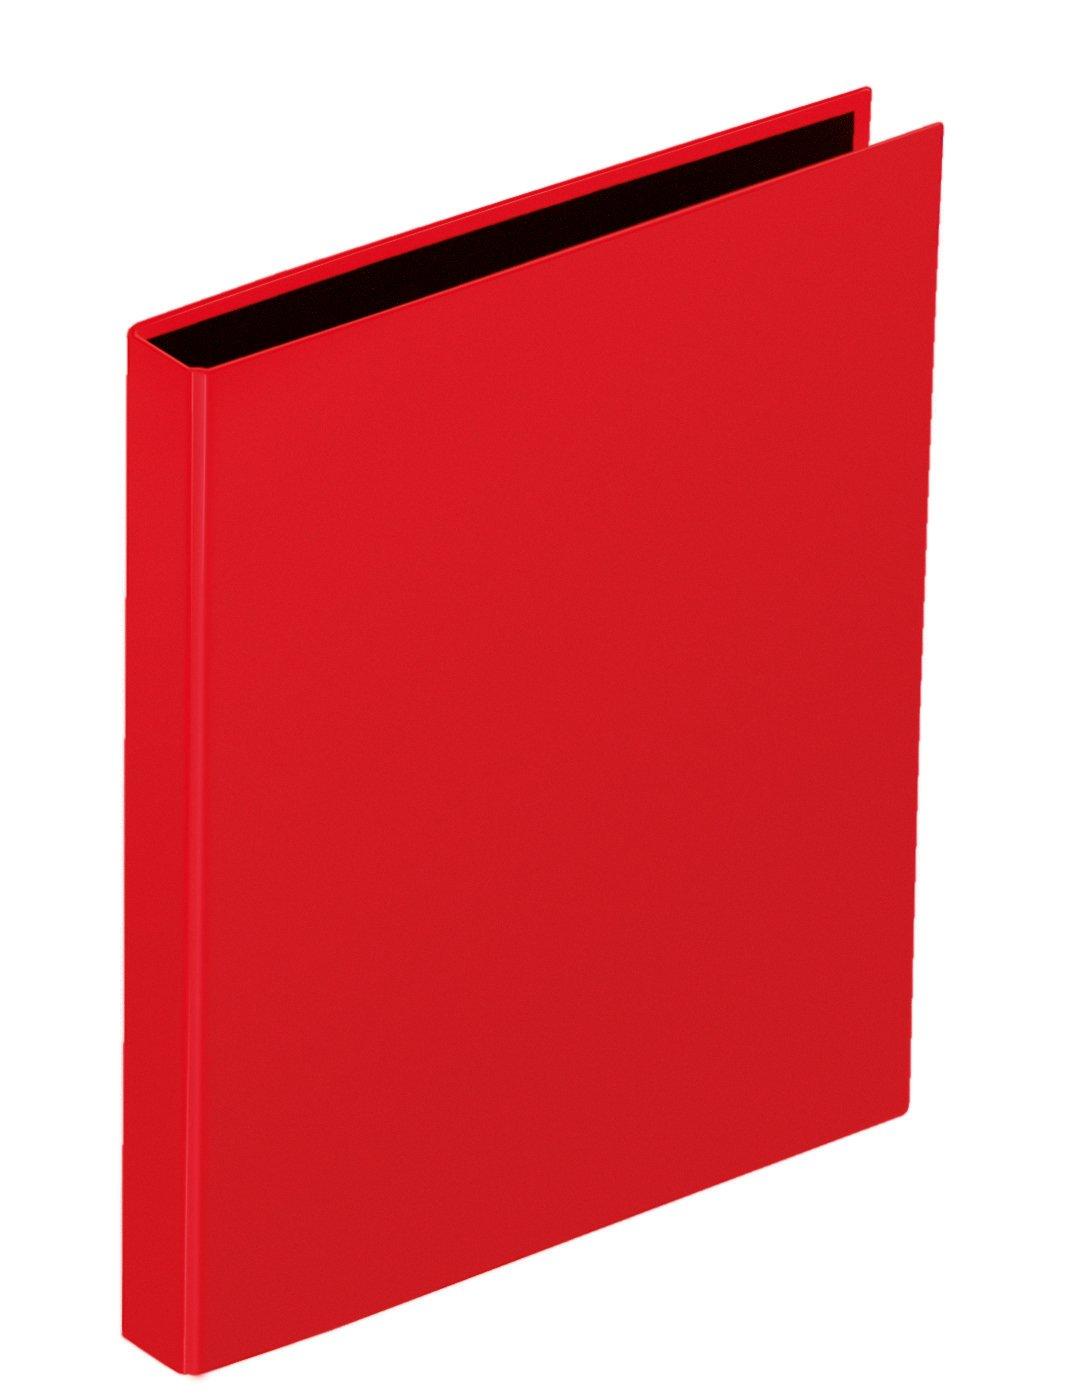 Pagna 2040703A5Basic Classeur à anneaux Rouge Pagna Papierverarbeitung Gnadau GmbH & Co. KG 20407-03